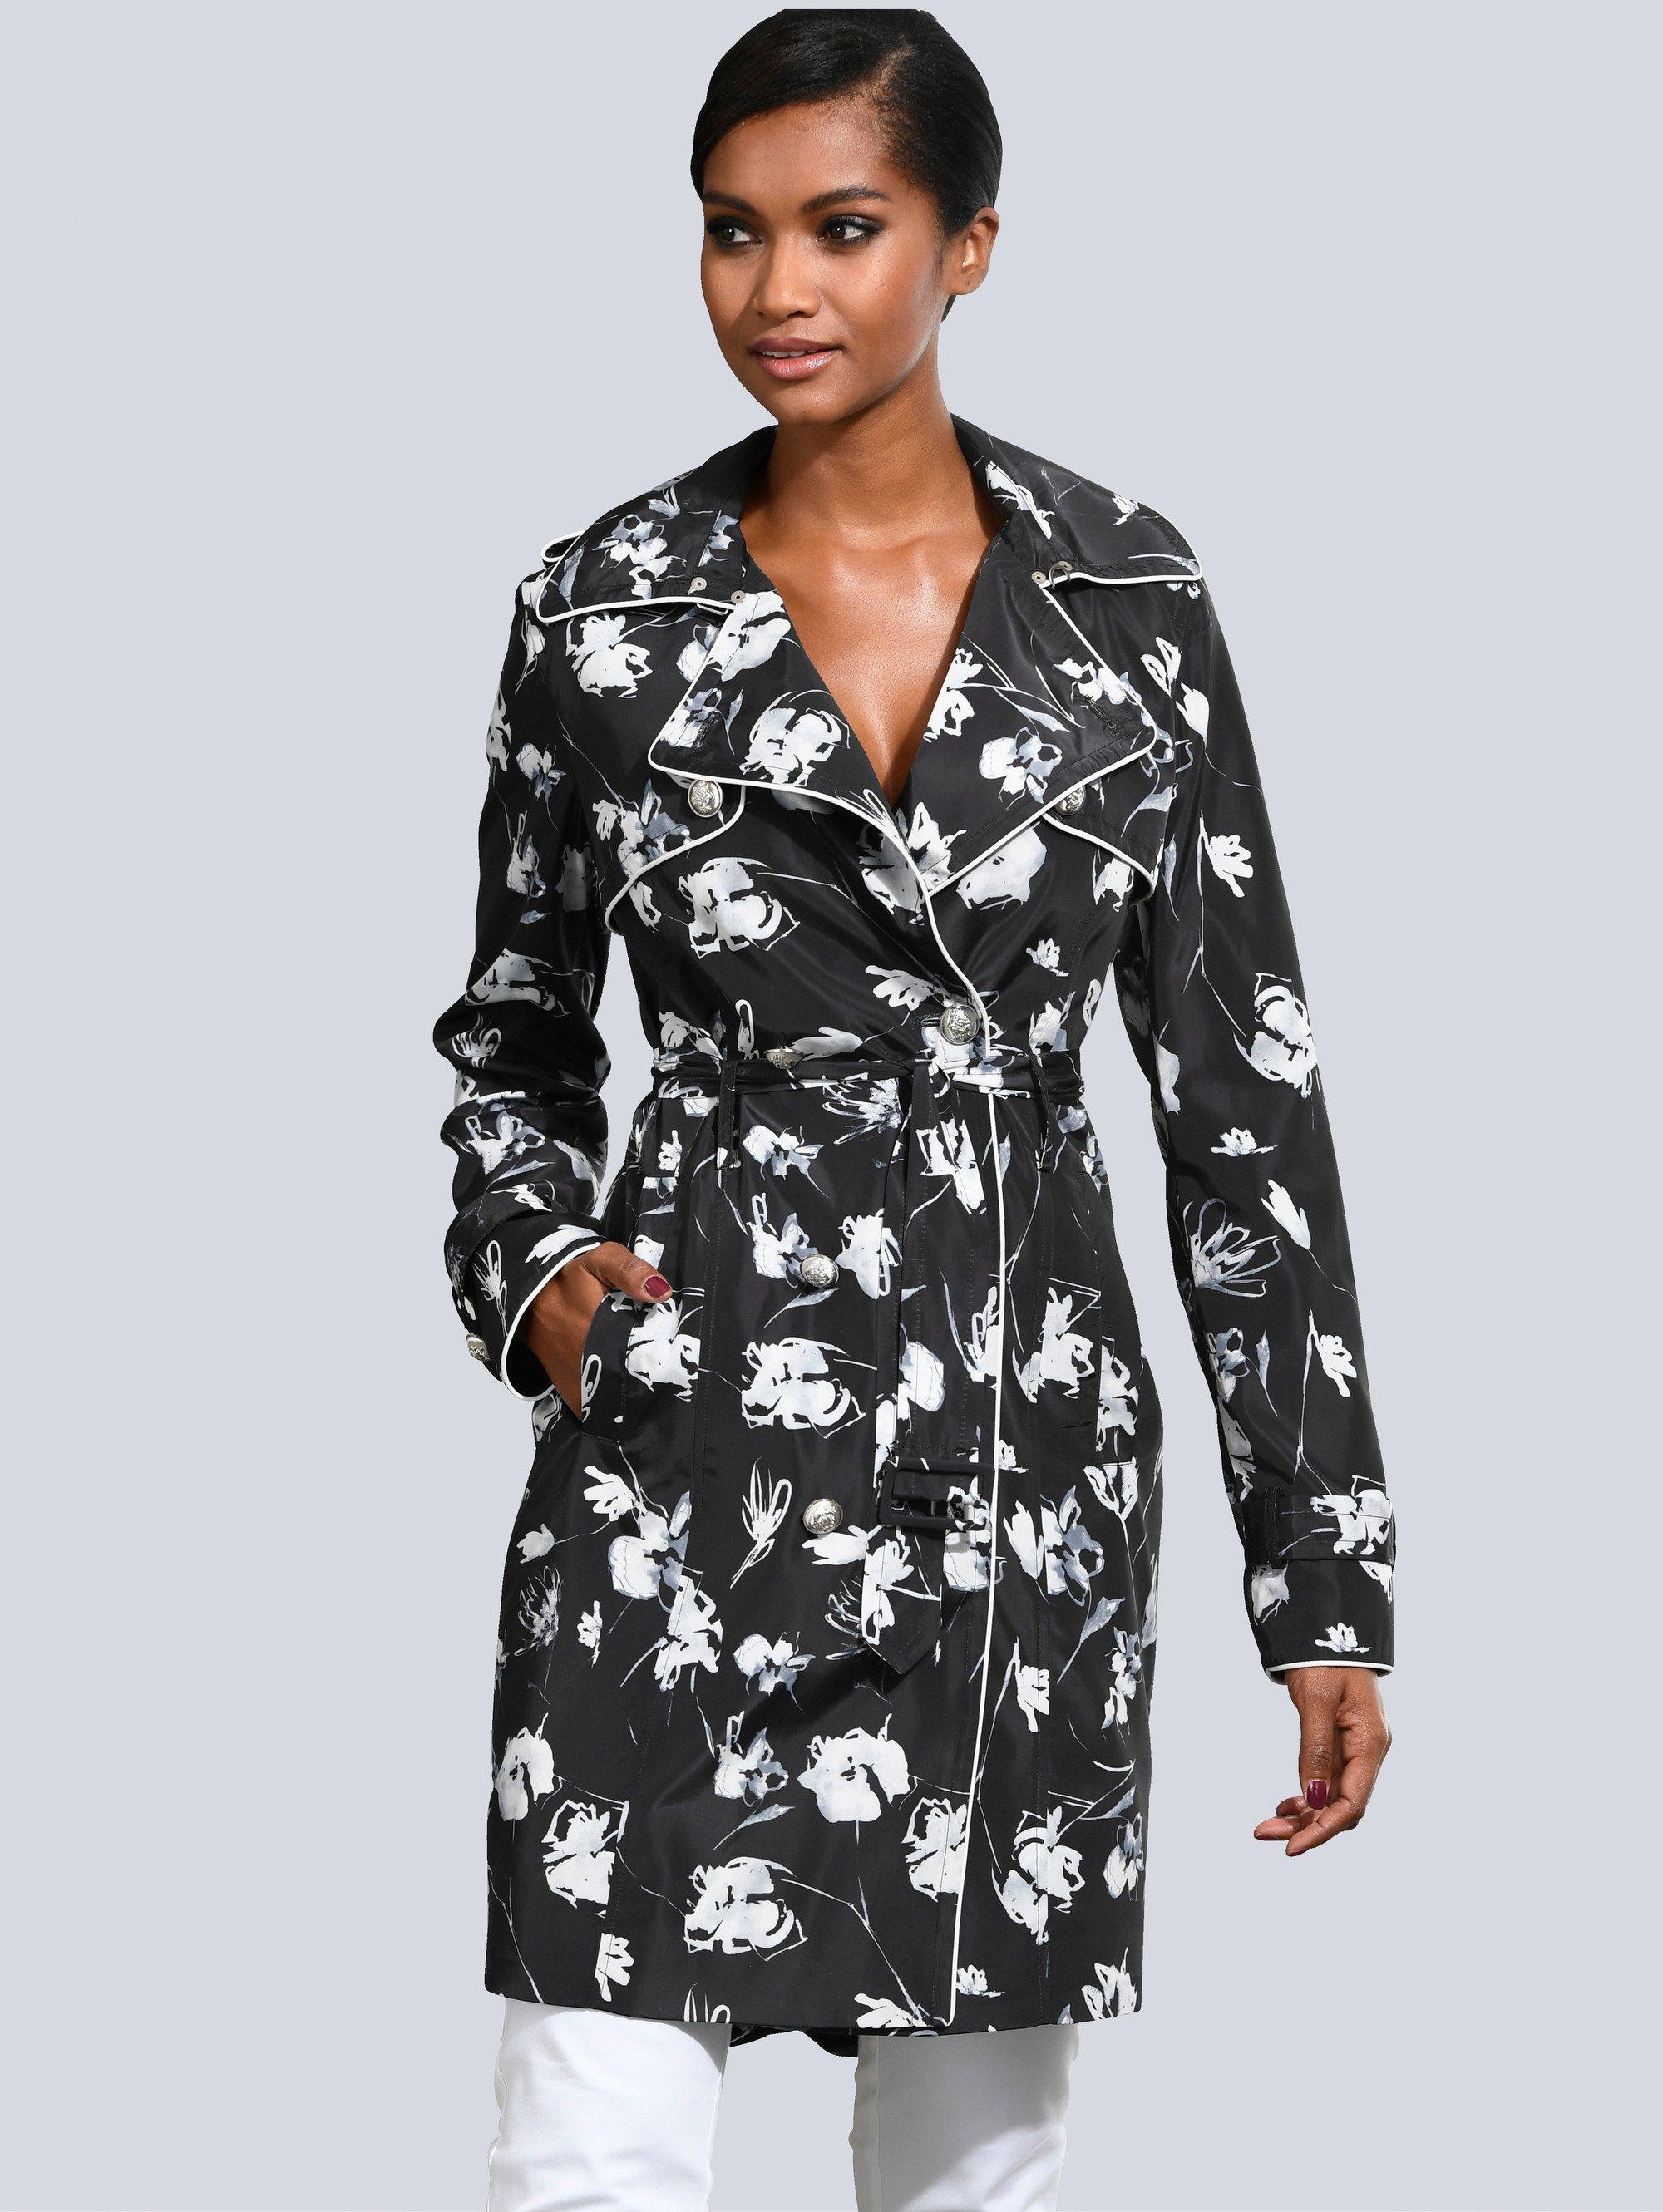 Alba Moda Trenchcoat im exklusiven Alba Moda Print   Bekleidung > Mäntel > Trenchcoats   Polyester   Alba Moda